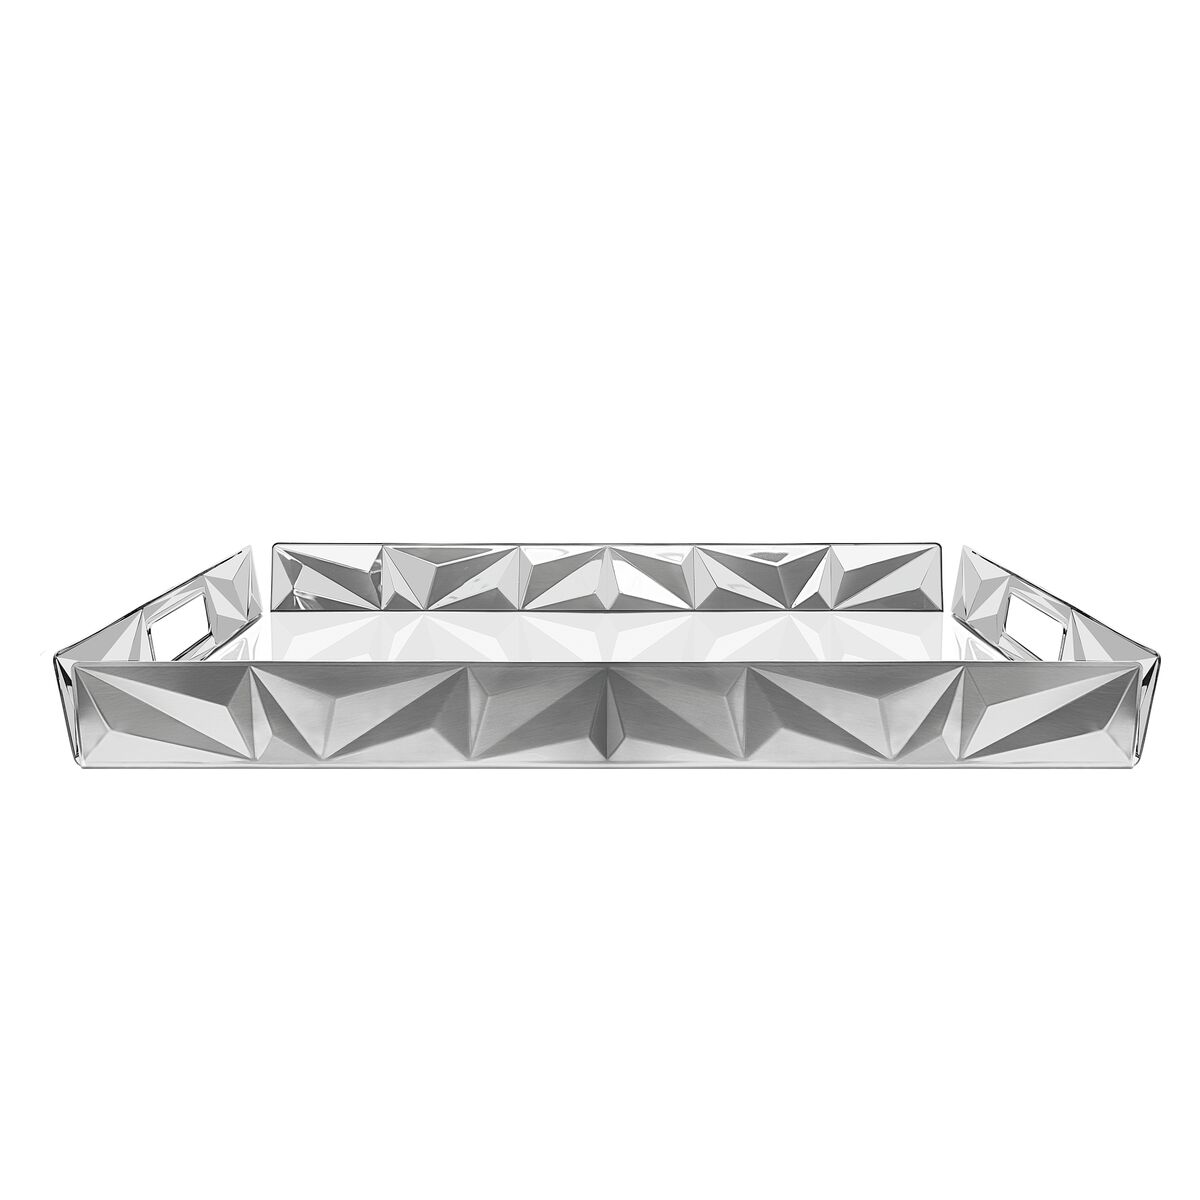 Tramontina Prisma rectangular stainless steel tray, 52 cm